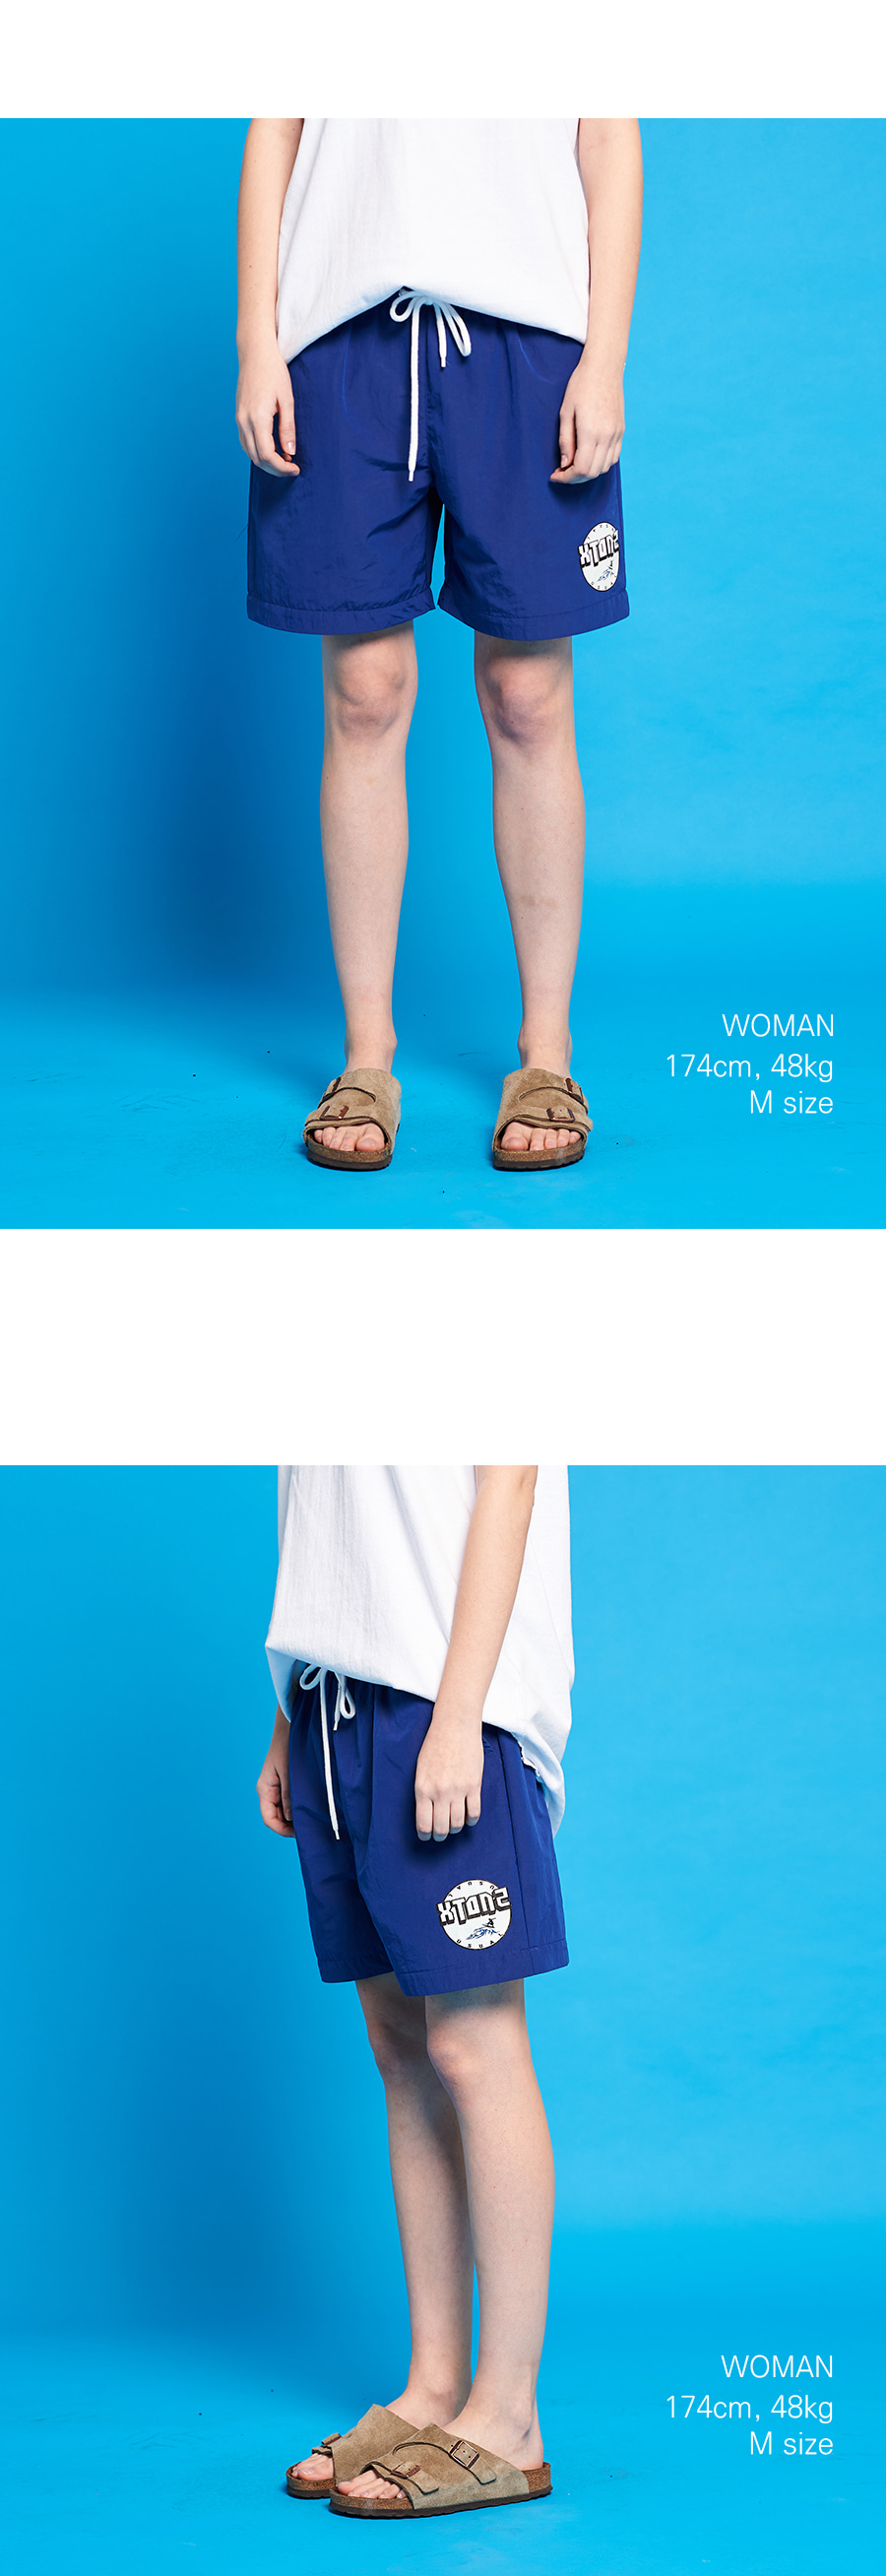 xtp001_bl_woman_1.jpg